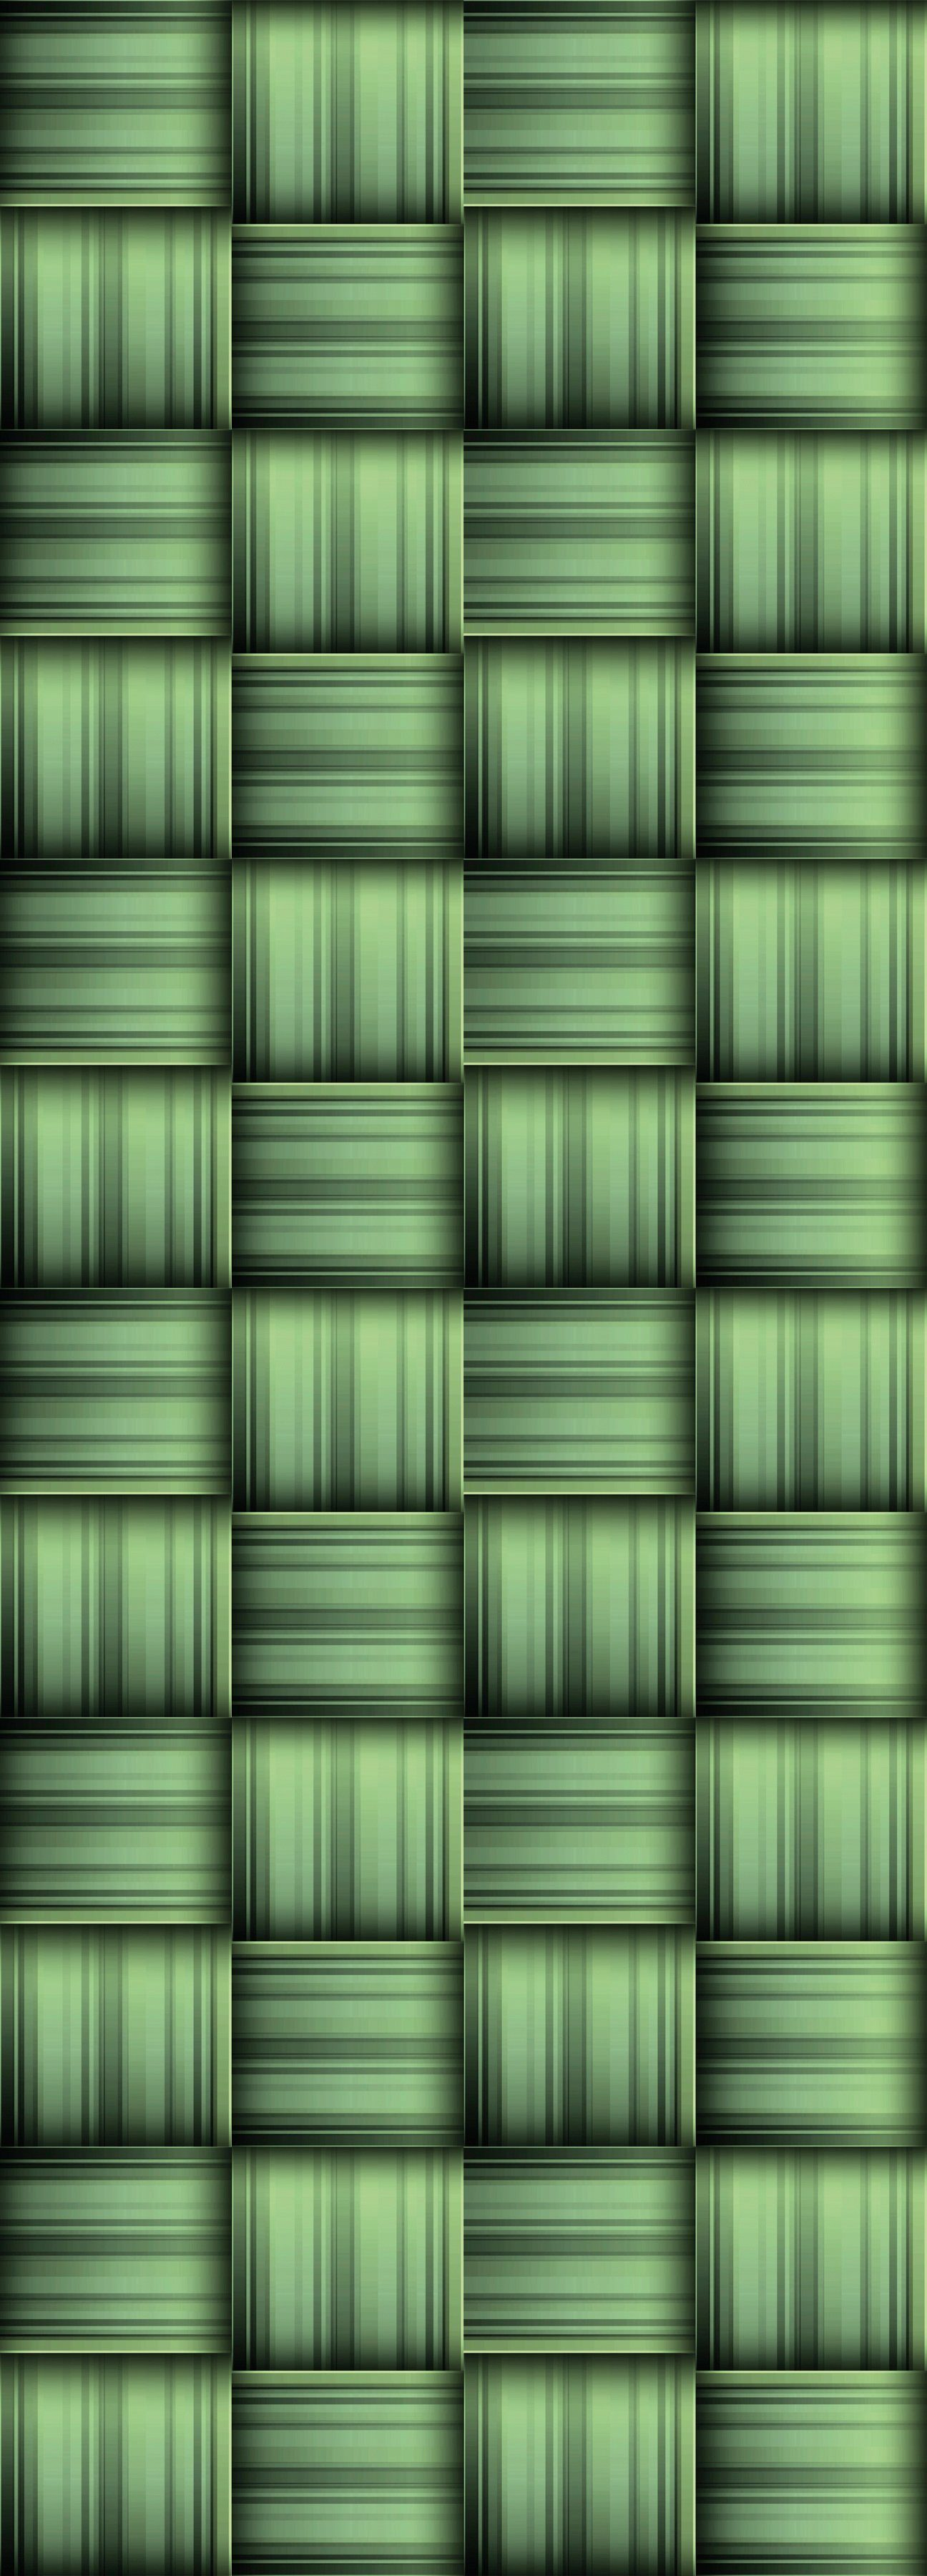 QUEENCE Vinyltapete »Toataiph«, 90 x 250 cm, selbstklebend